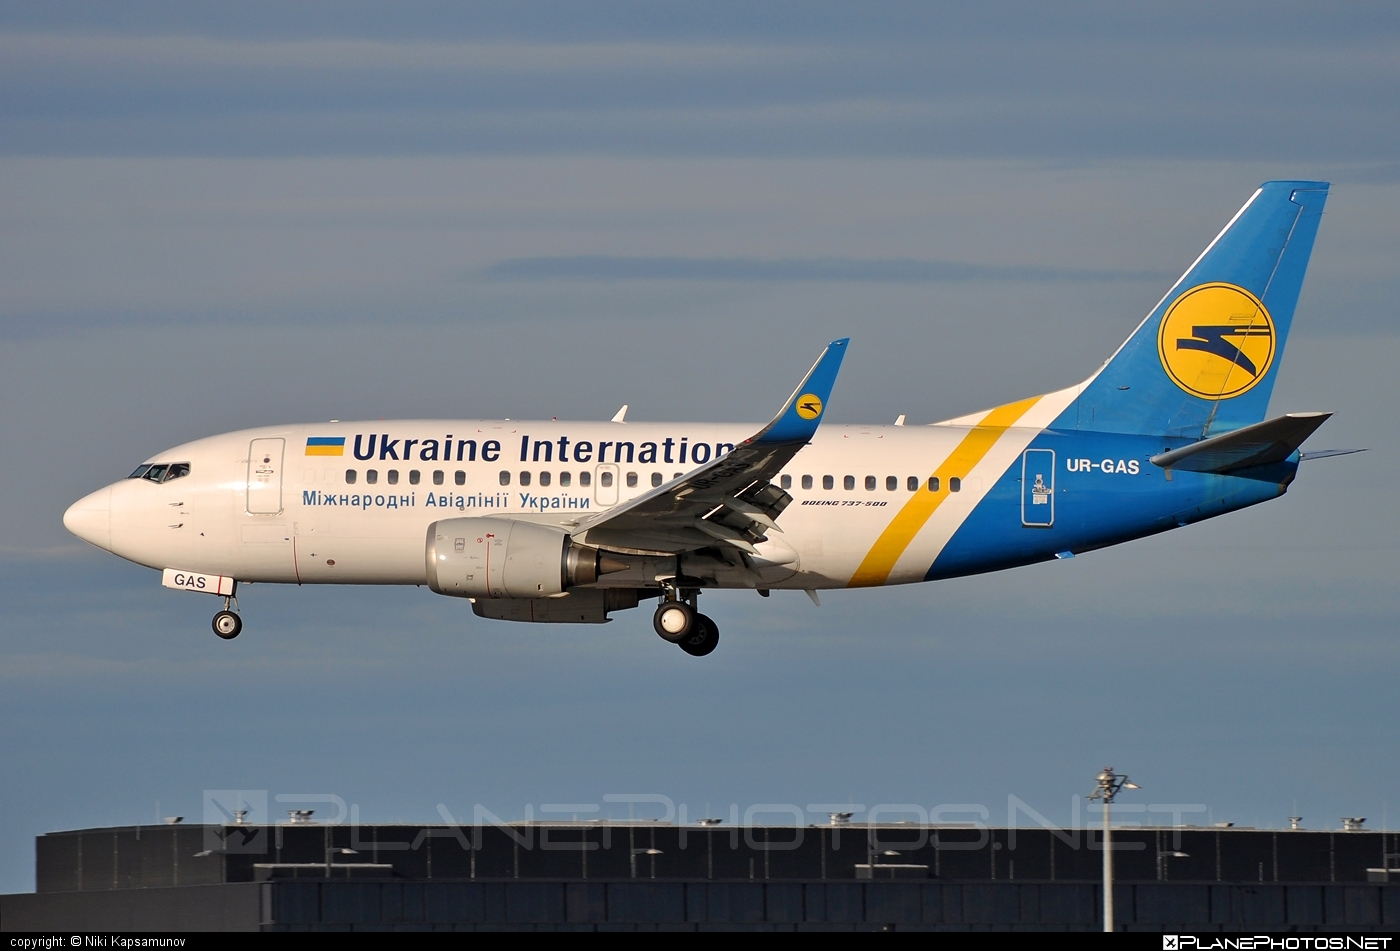 Boeing 737-500 - UR-GAS operated by Ukraine International Airlines #b737 #boeing #boeing737 #uia #ukraineinternationalairlines